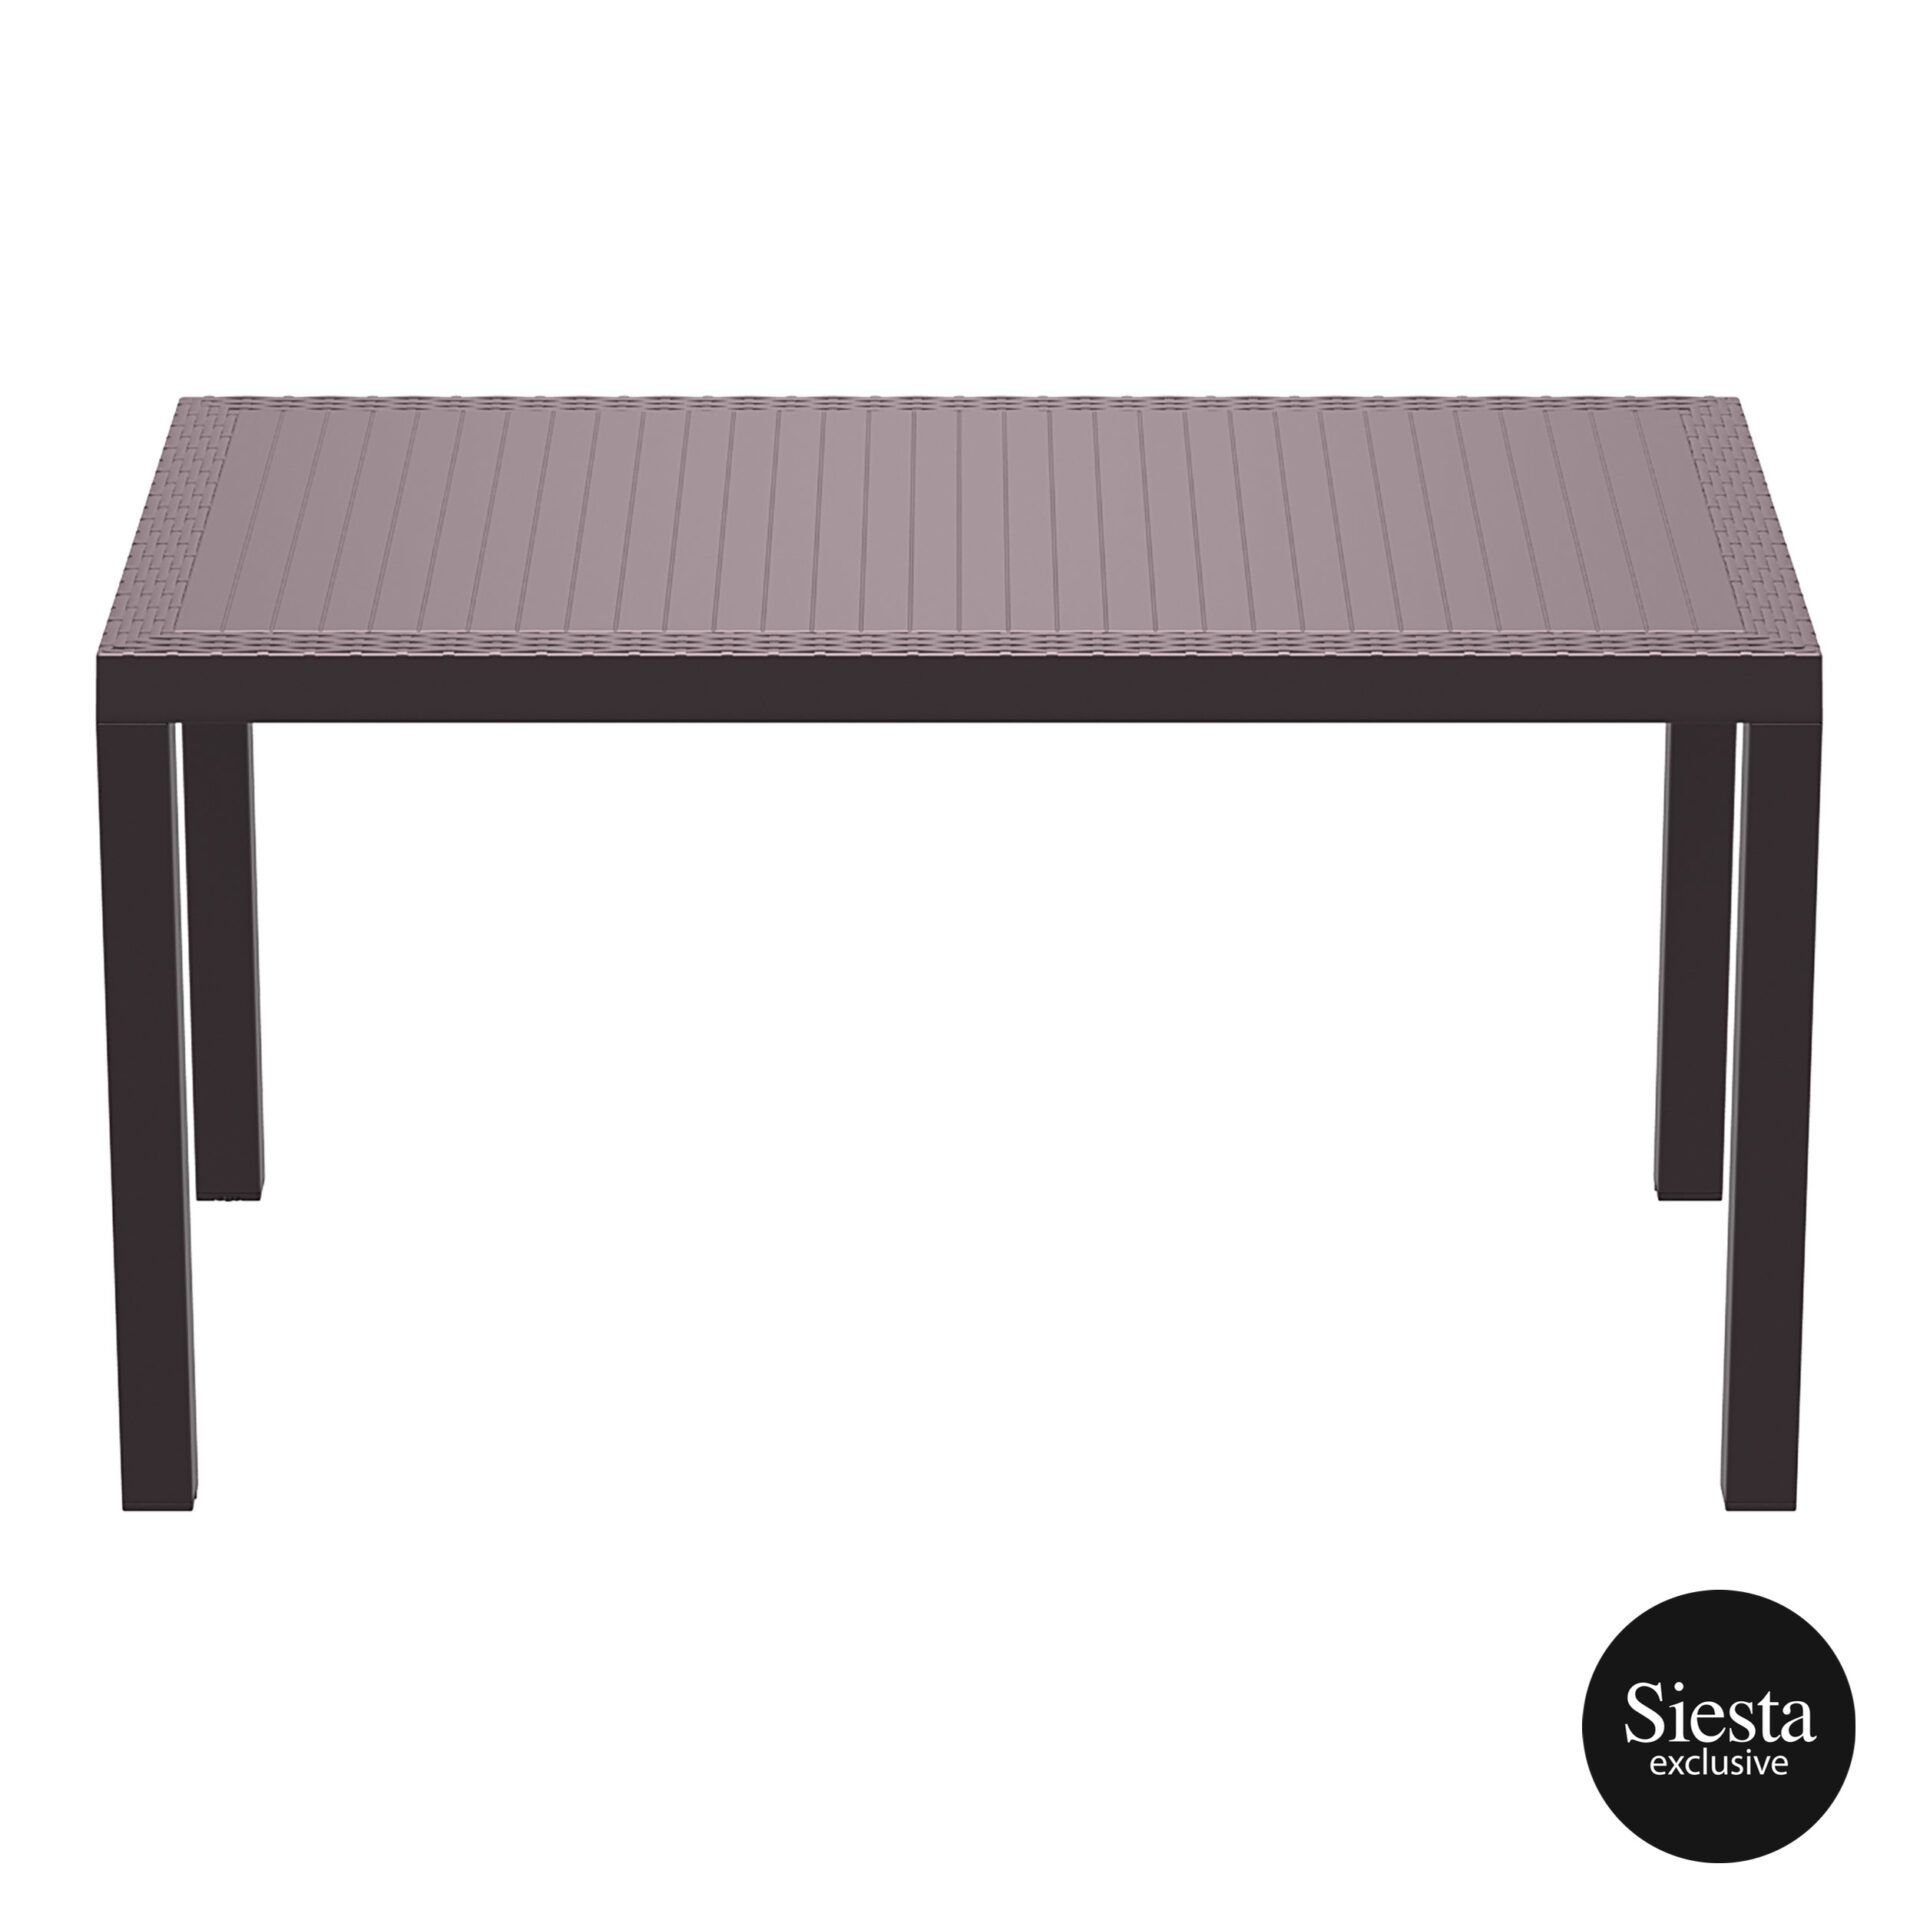 outdoor resin rattan cafe plastic top bali table 140 brown long edge 1